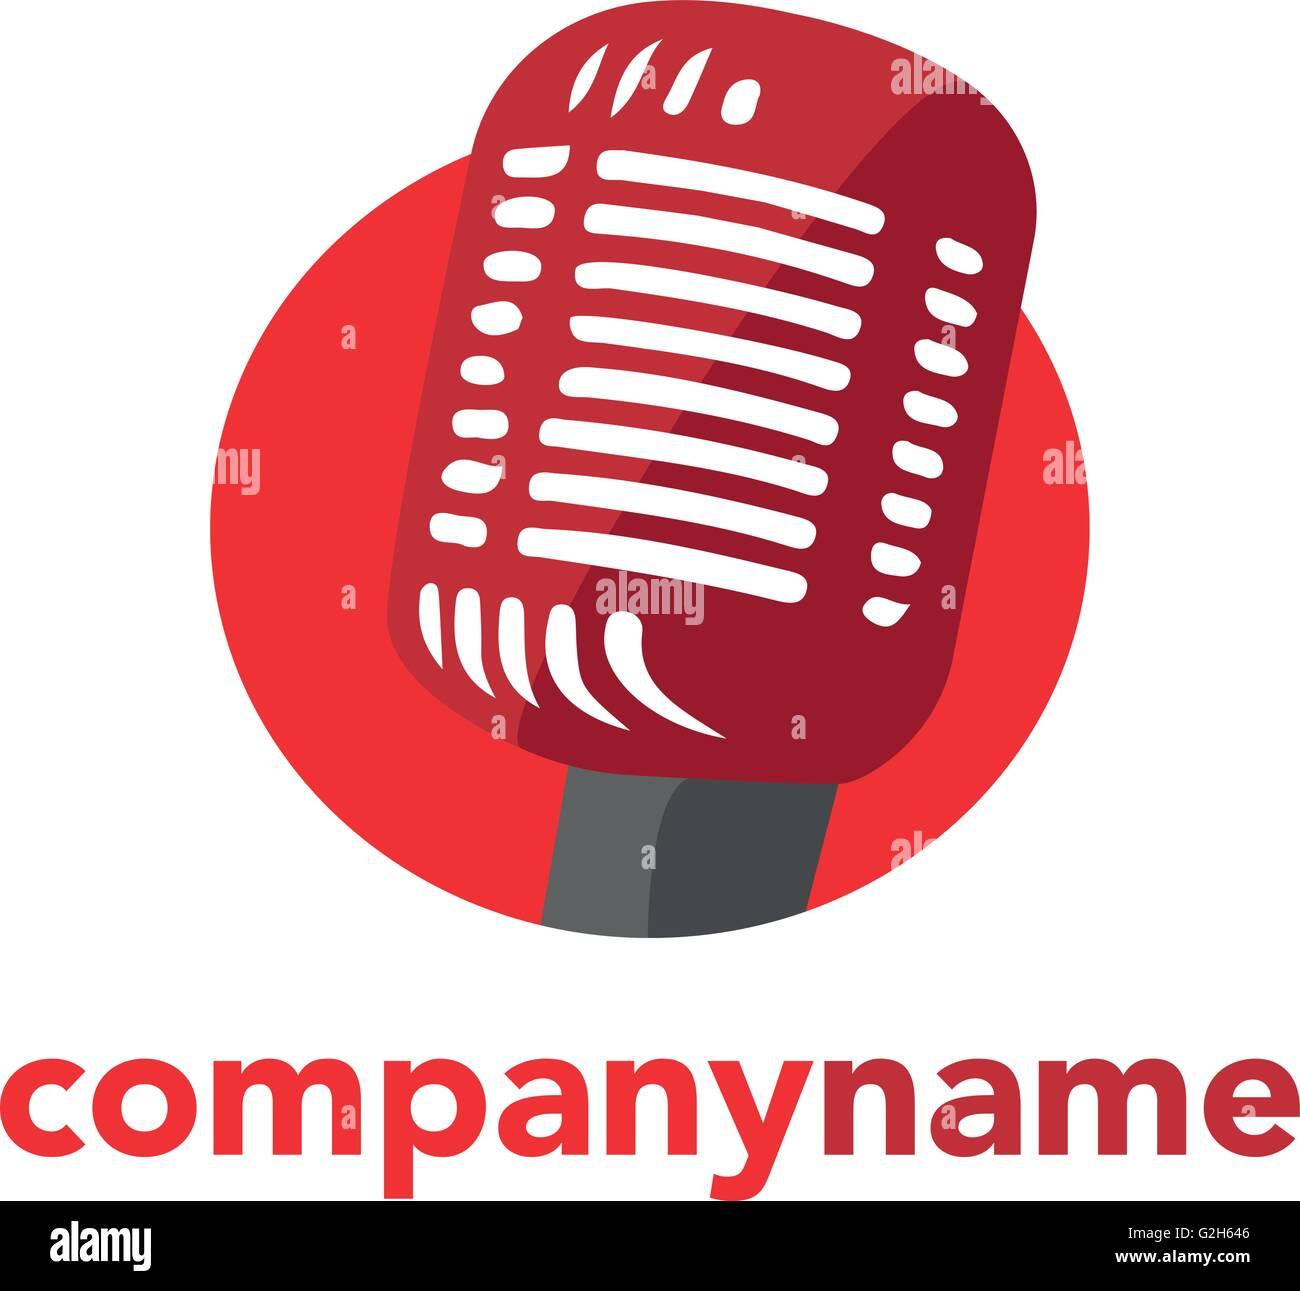 Microphone icon logo. Speaker symbol. Live music sign. Vector illustration. - Stock Image